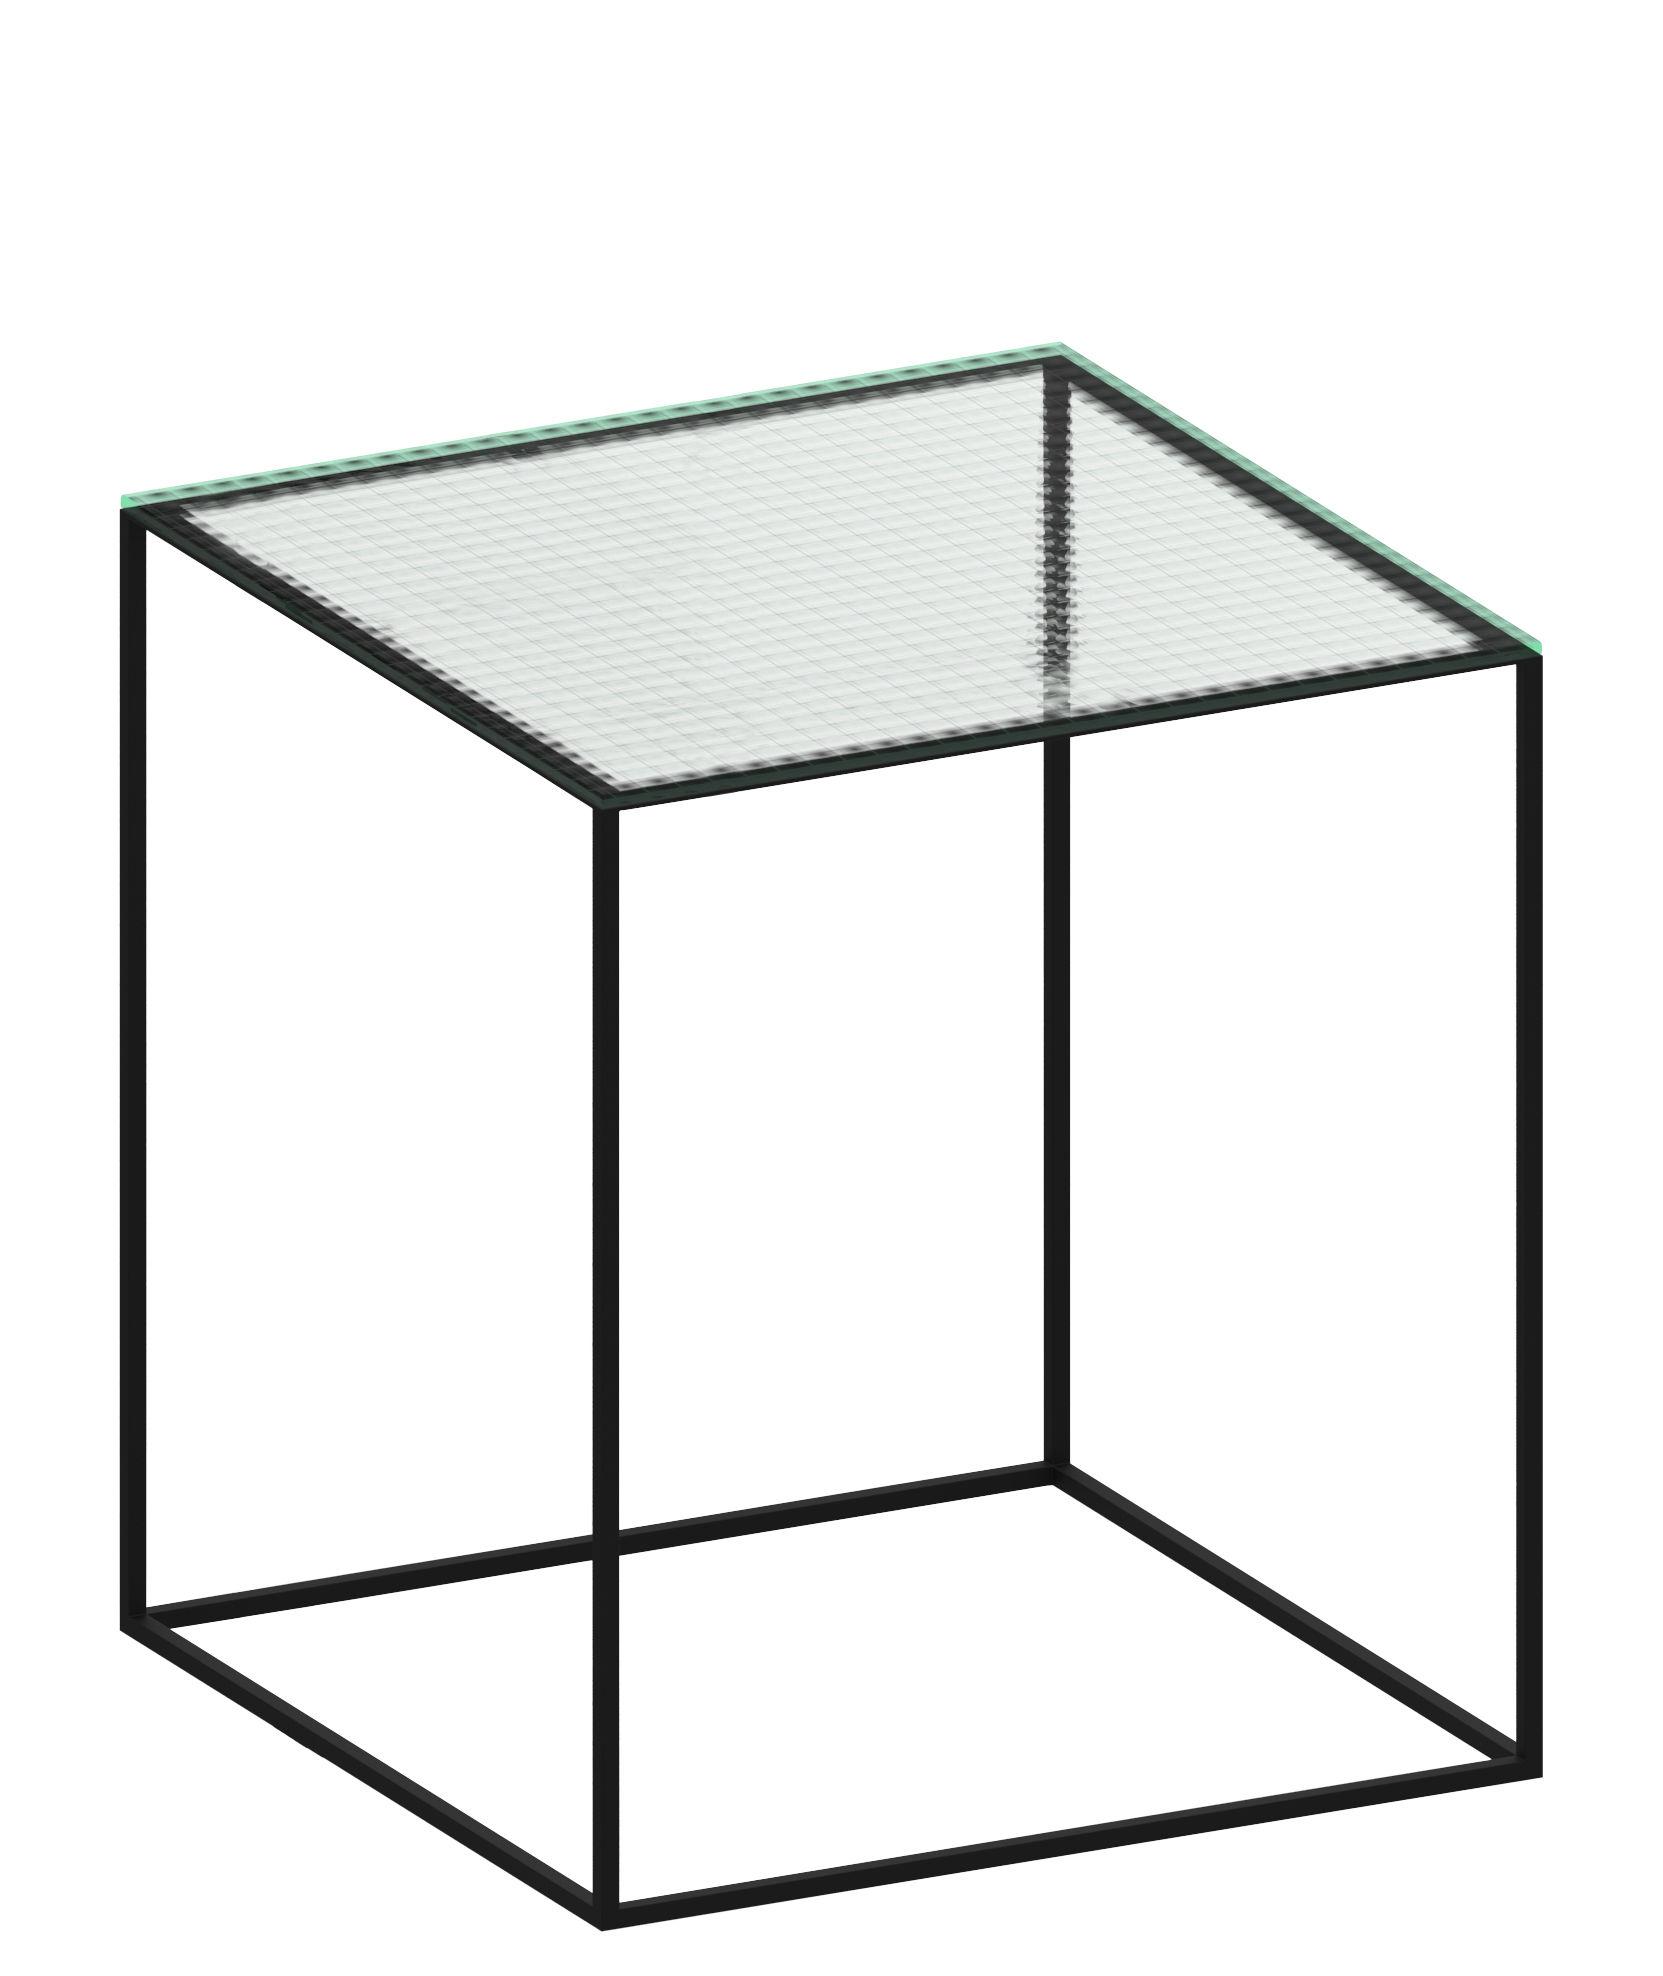 Arredamento - Tavolini  - Tavolino Slim Irony - Vetro trasparente / Piede nero ramato - Acciaio verniciato, Verre armé